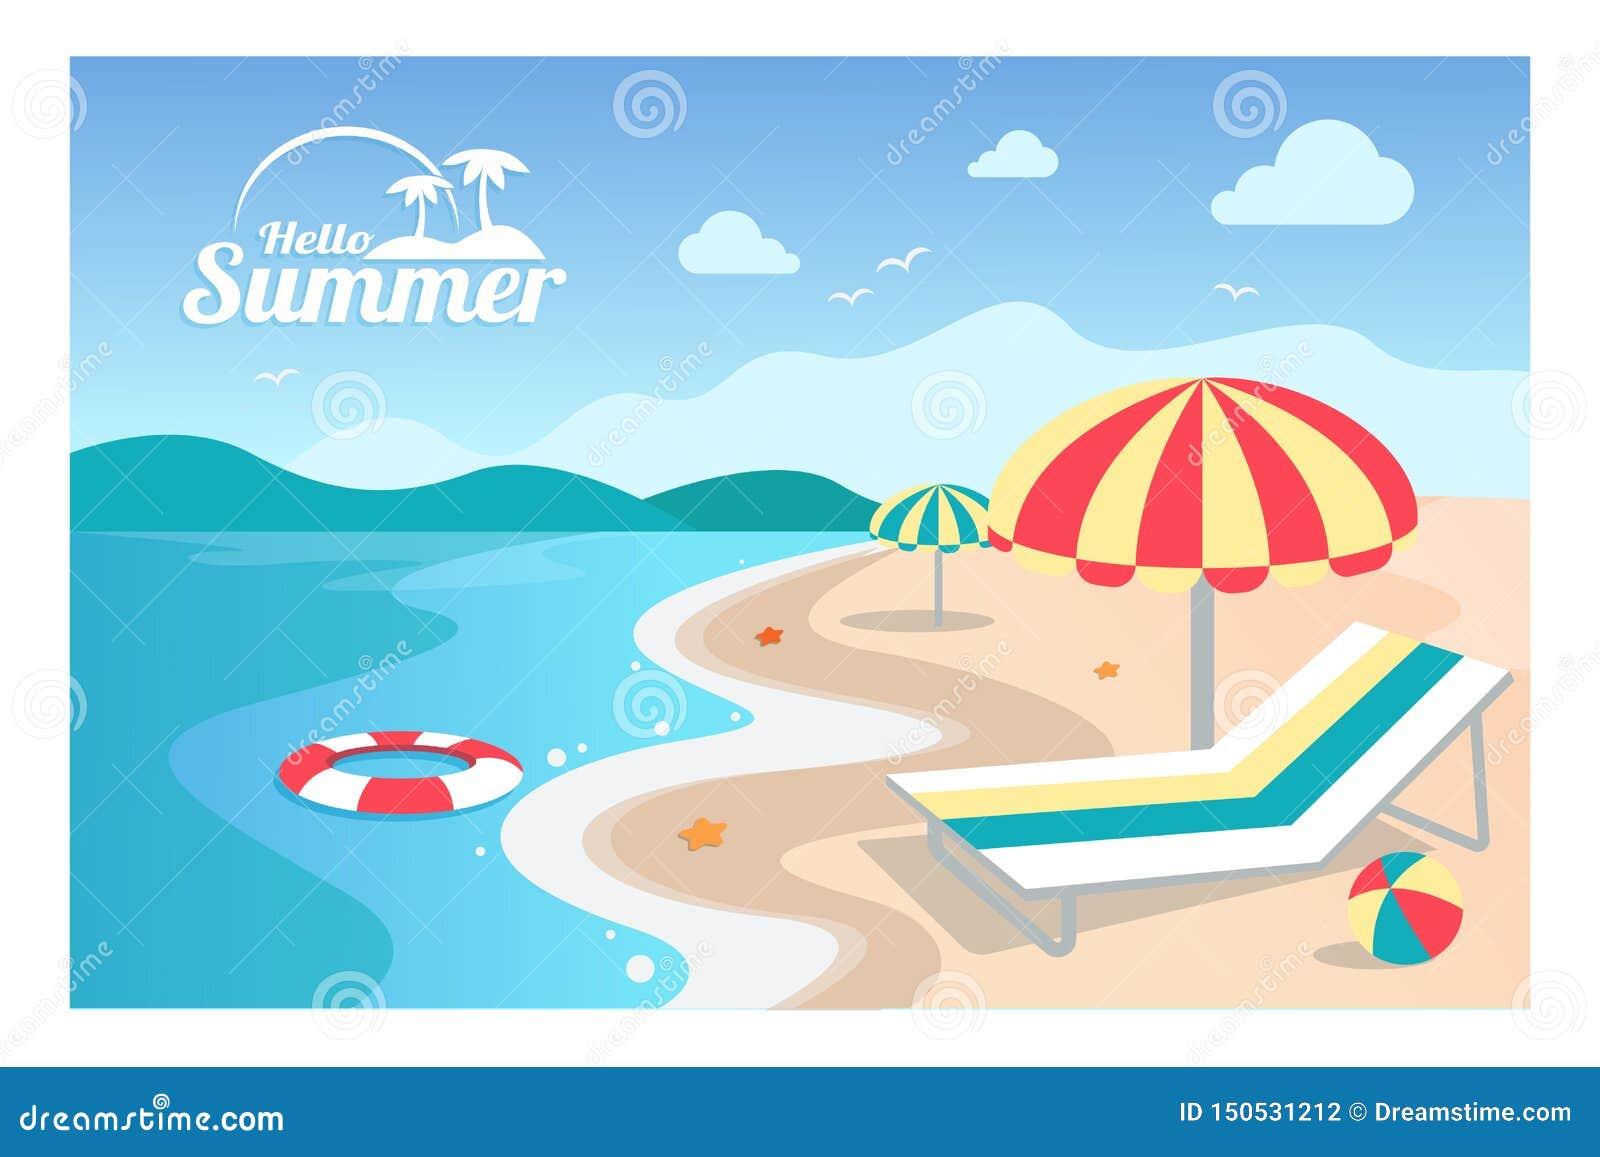 Summer background vector illustration